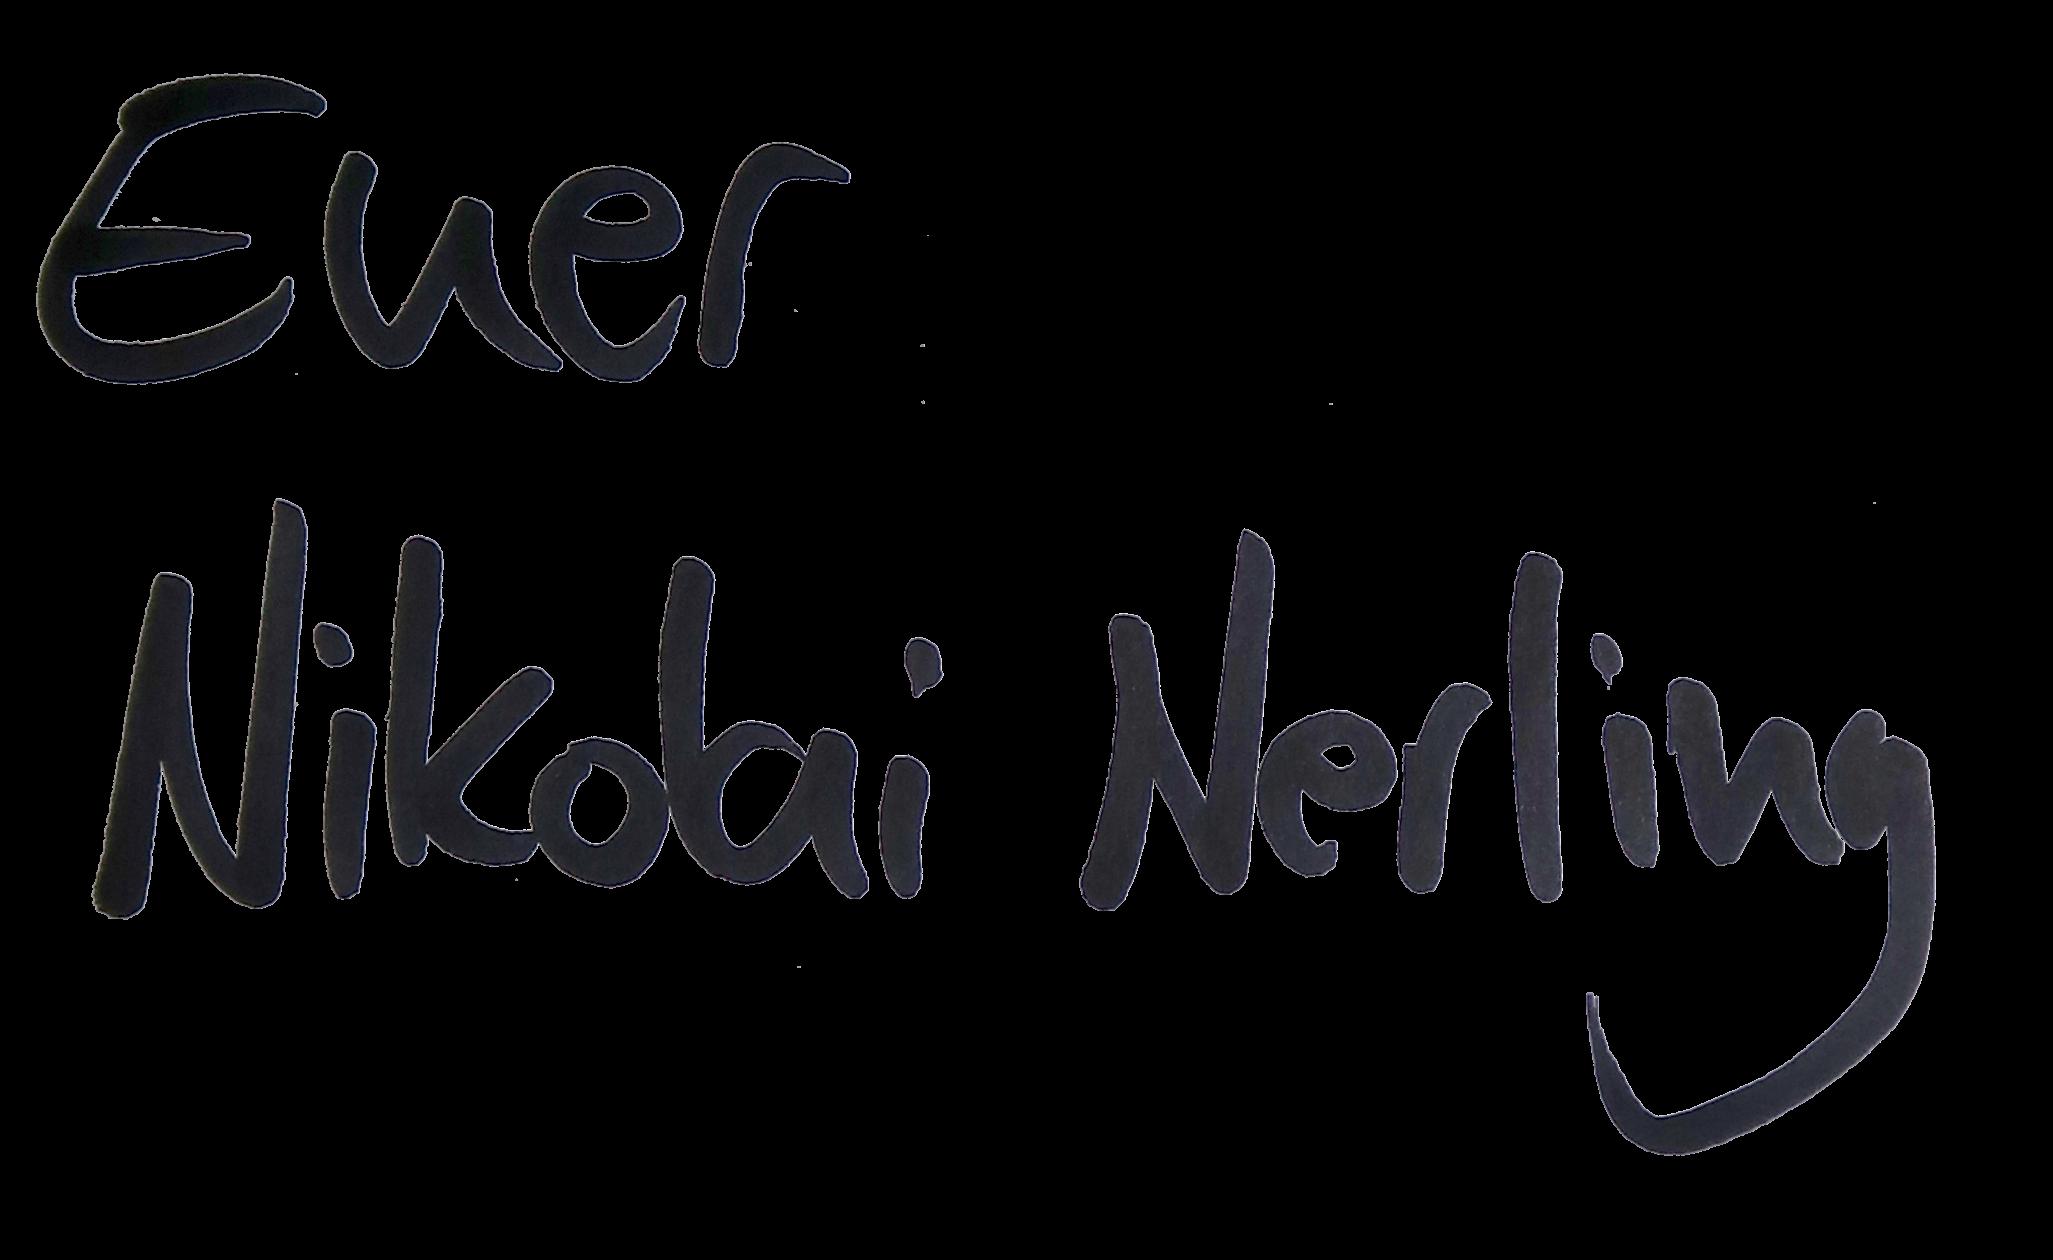 NikolaiNerling-Signatur - 'Euer Nikolai Nerling'.png